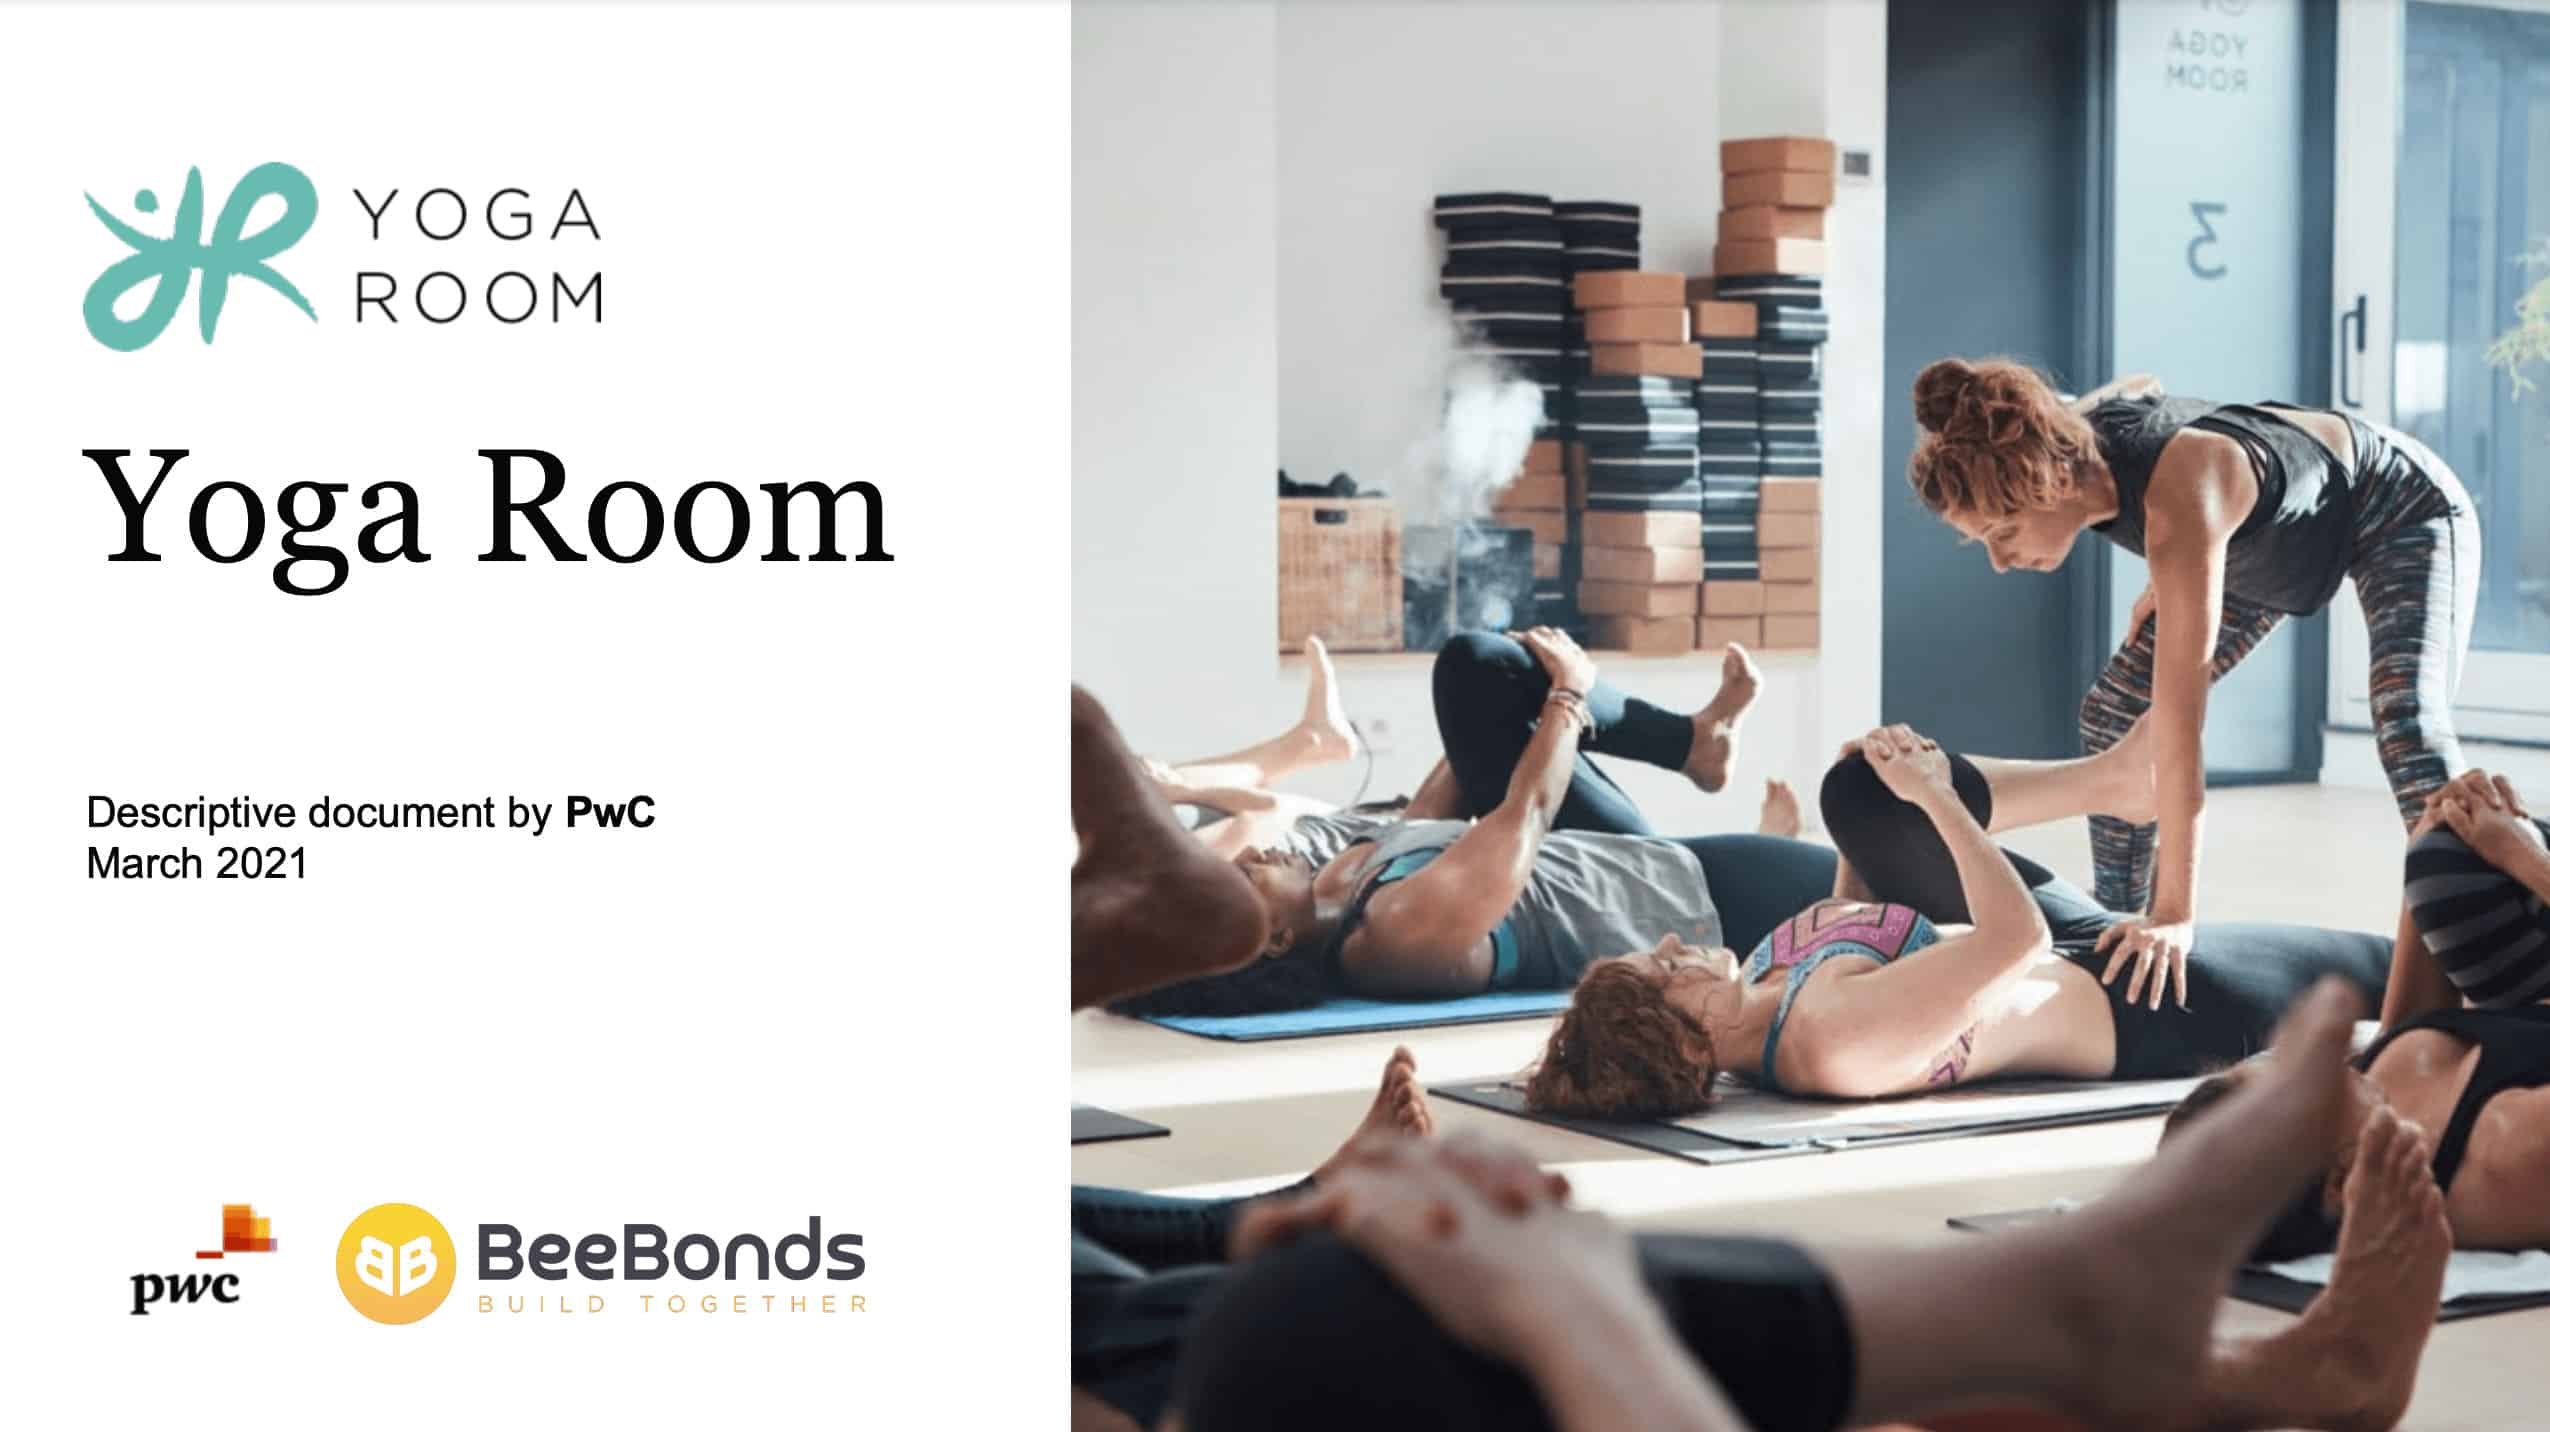 Yoga Room - Couverte note descriptive BeeBonds